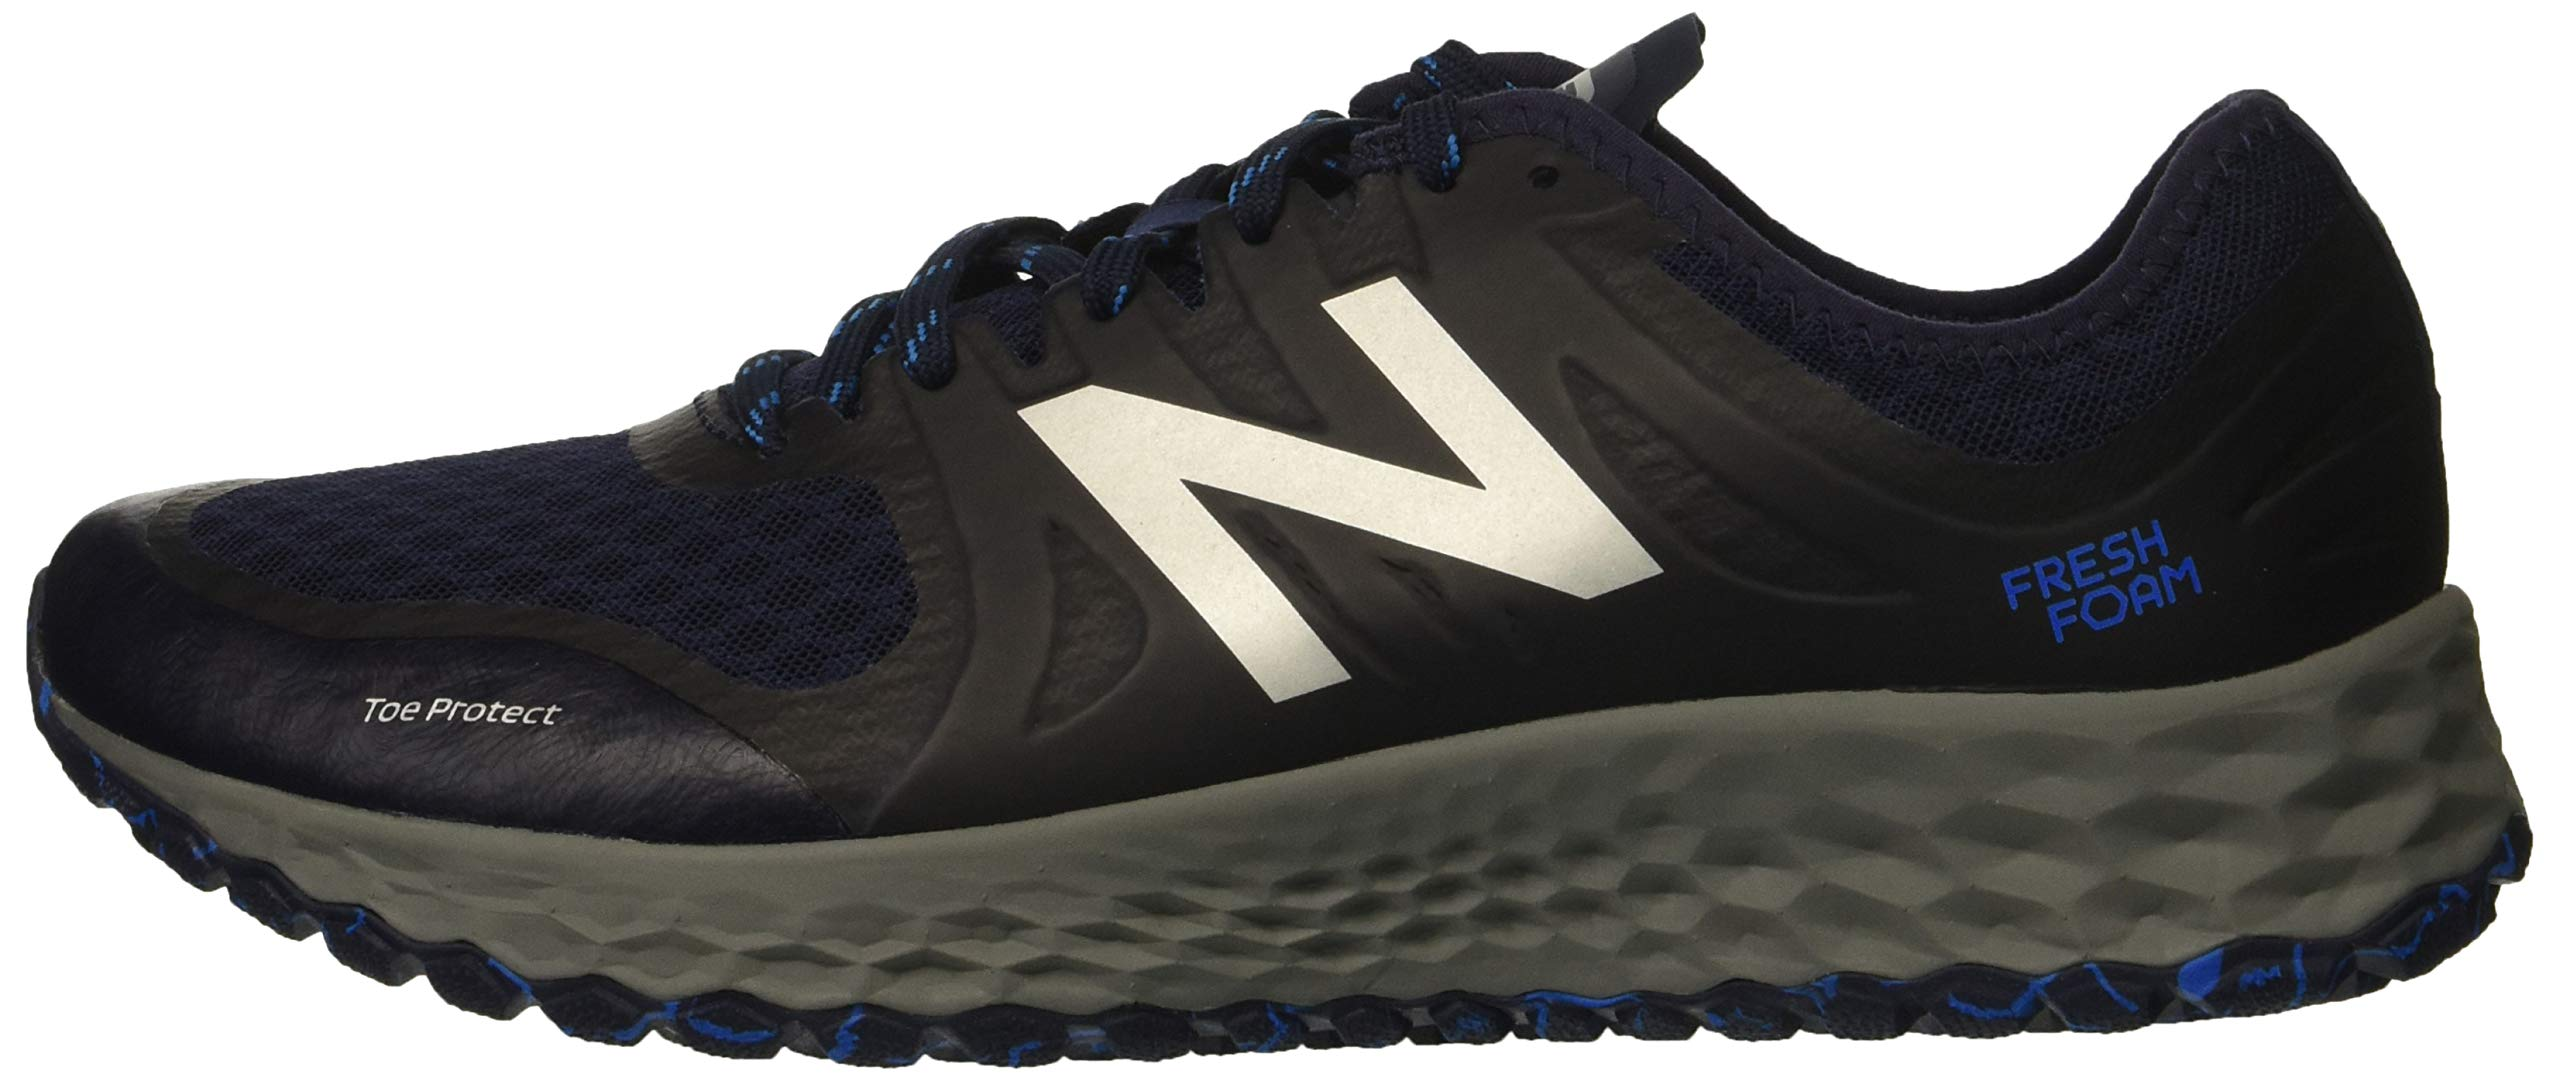 New Balance Men's Kaymin V1 Fresh Foam Trail Running Shoe Pigment/Laser Blue 1.5 D US by New Balance (Image #5)